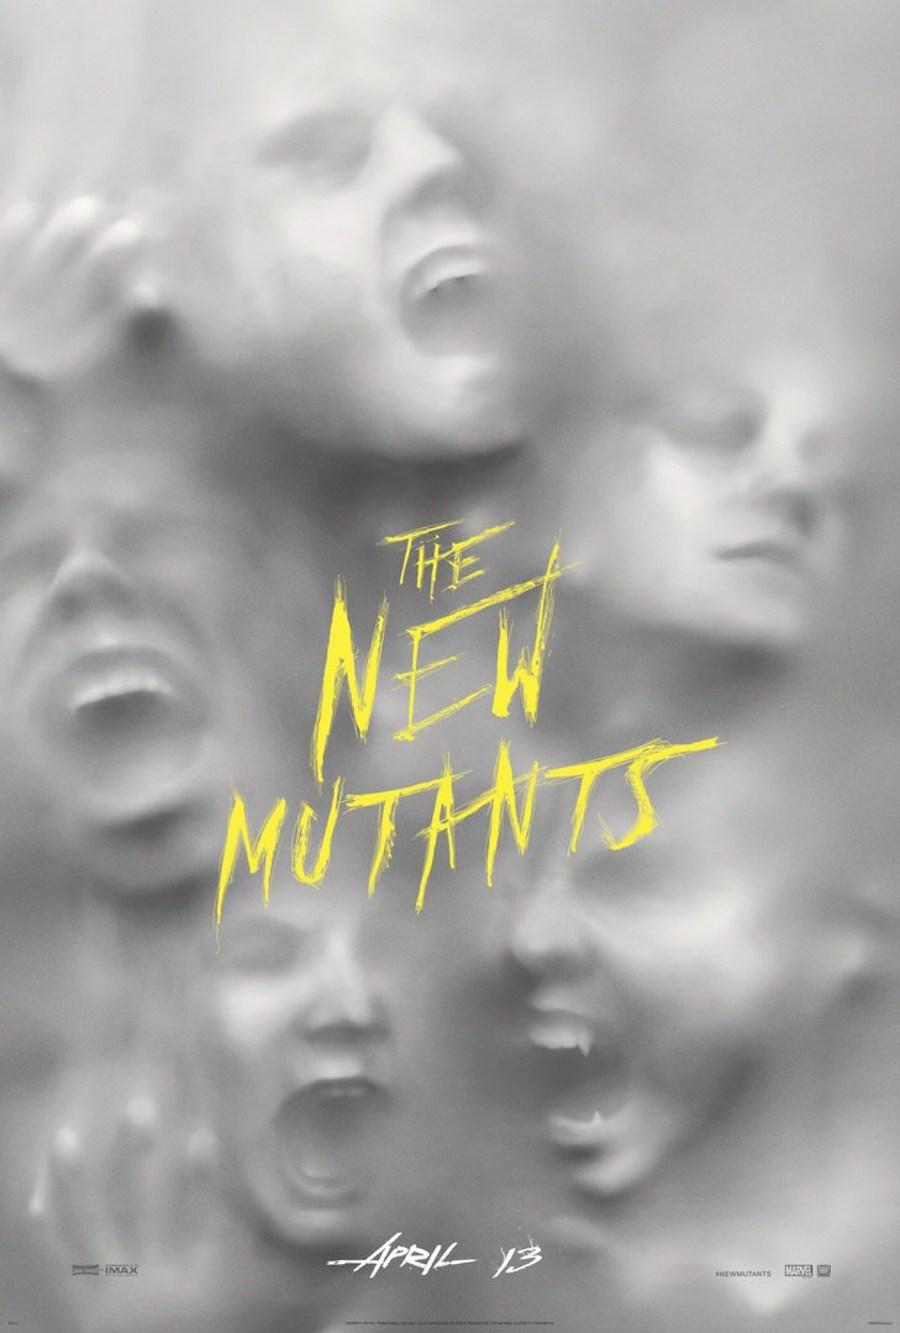 the-new-mutants-movie-poster-1063557.jpg